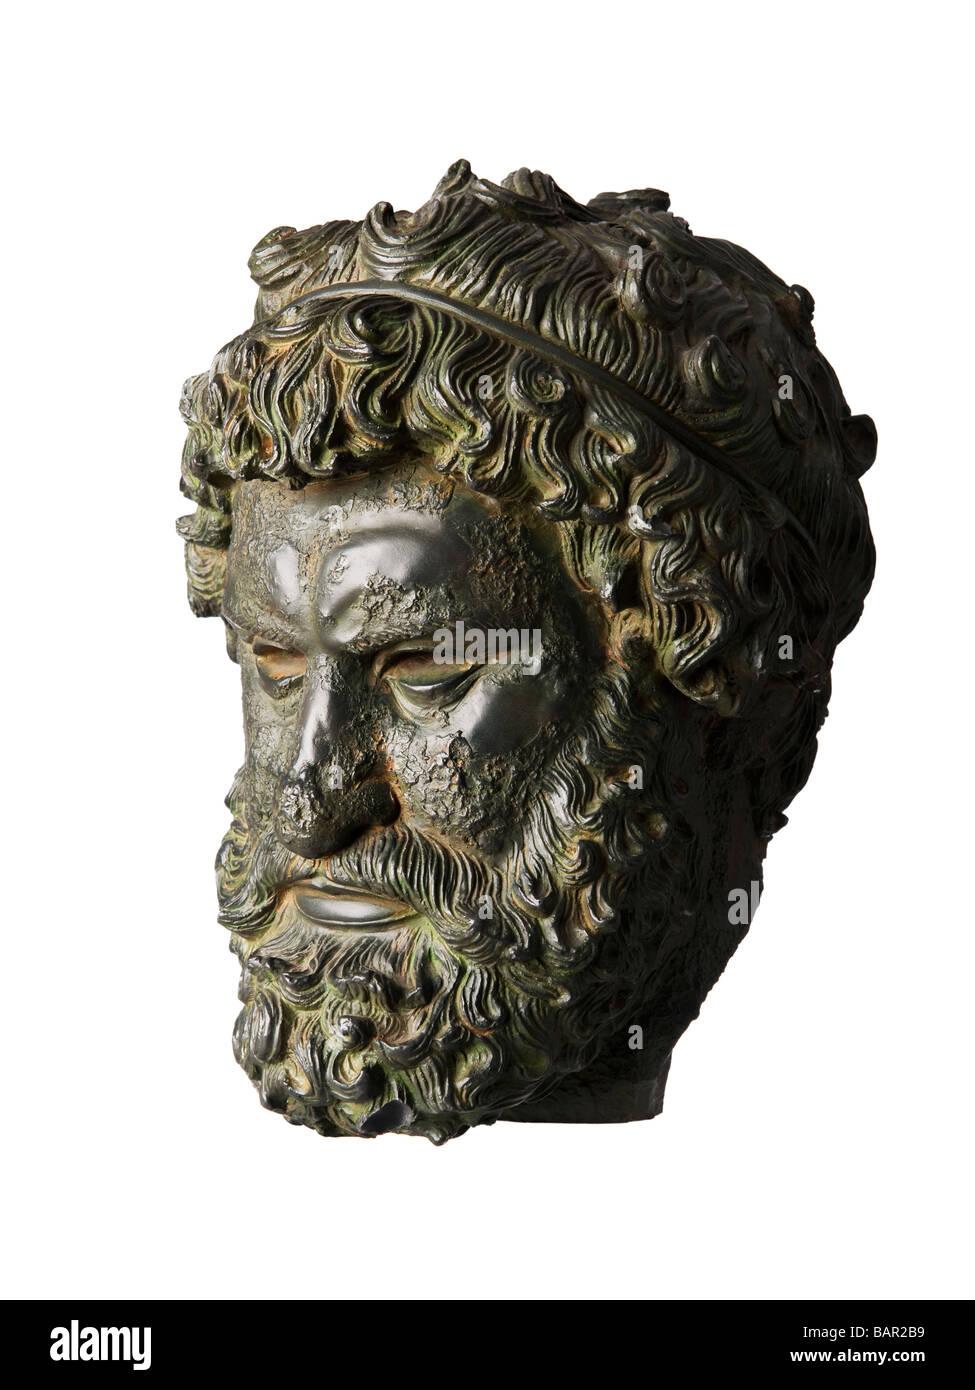 Greek bronze sculpture bearded man head - Stock Image